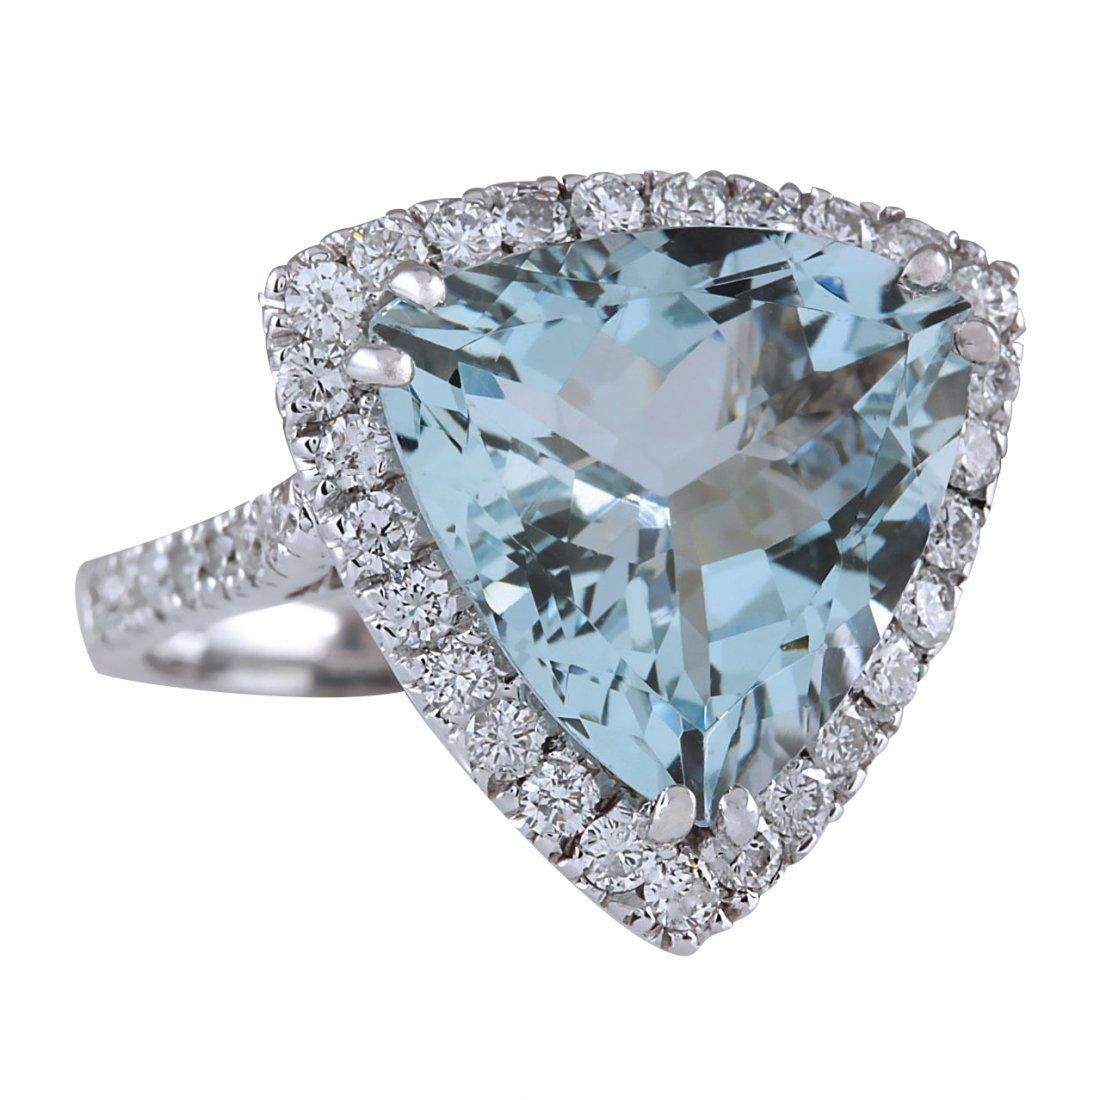 7.75CTW Natural Aquamarine And Diamond Ring In 14K - 2